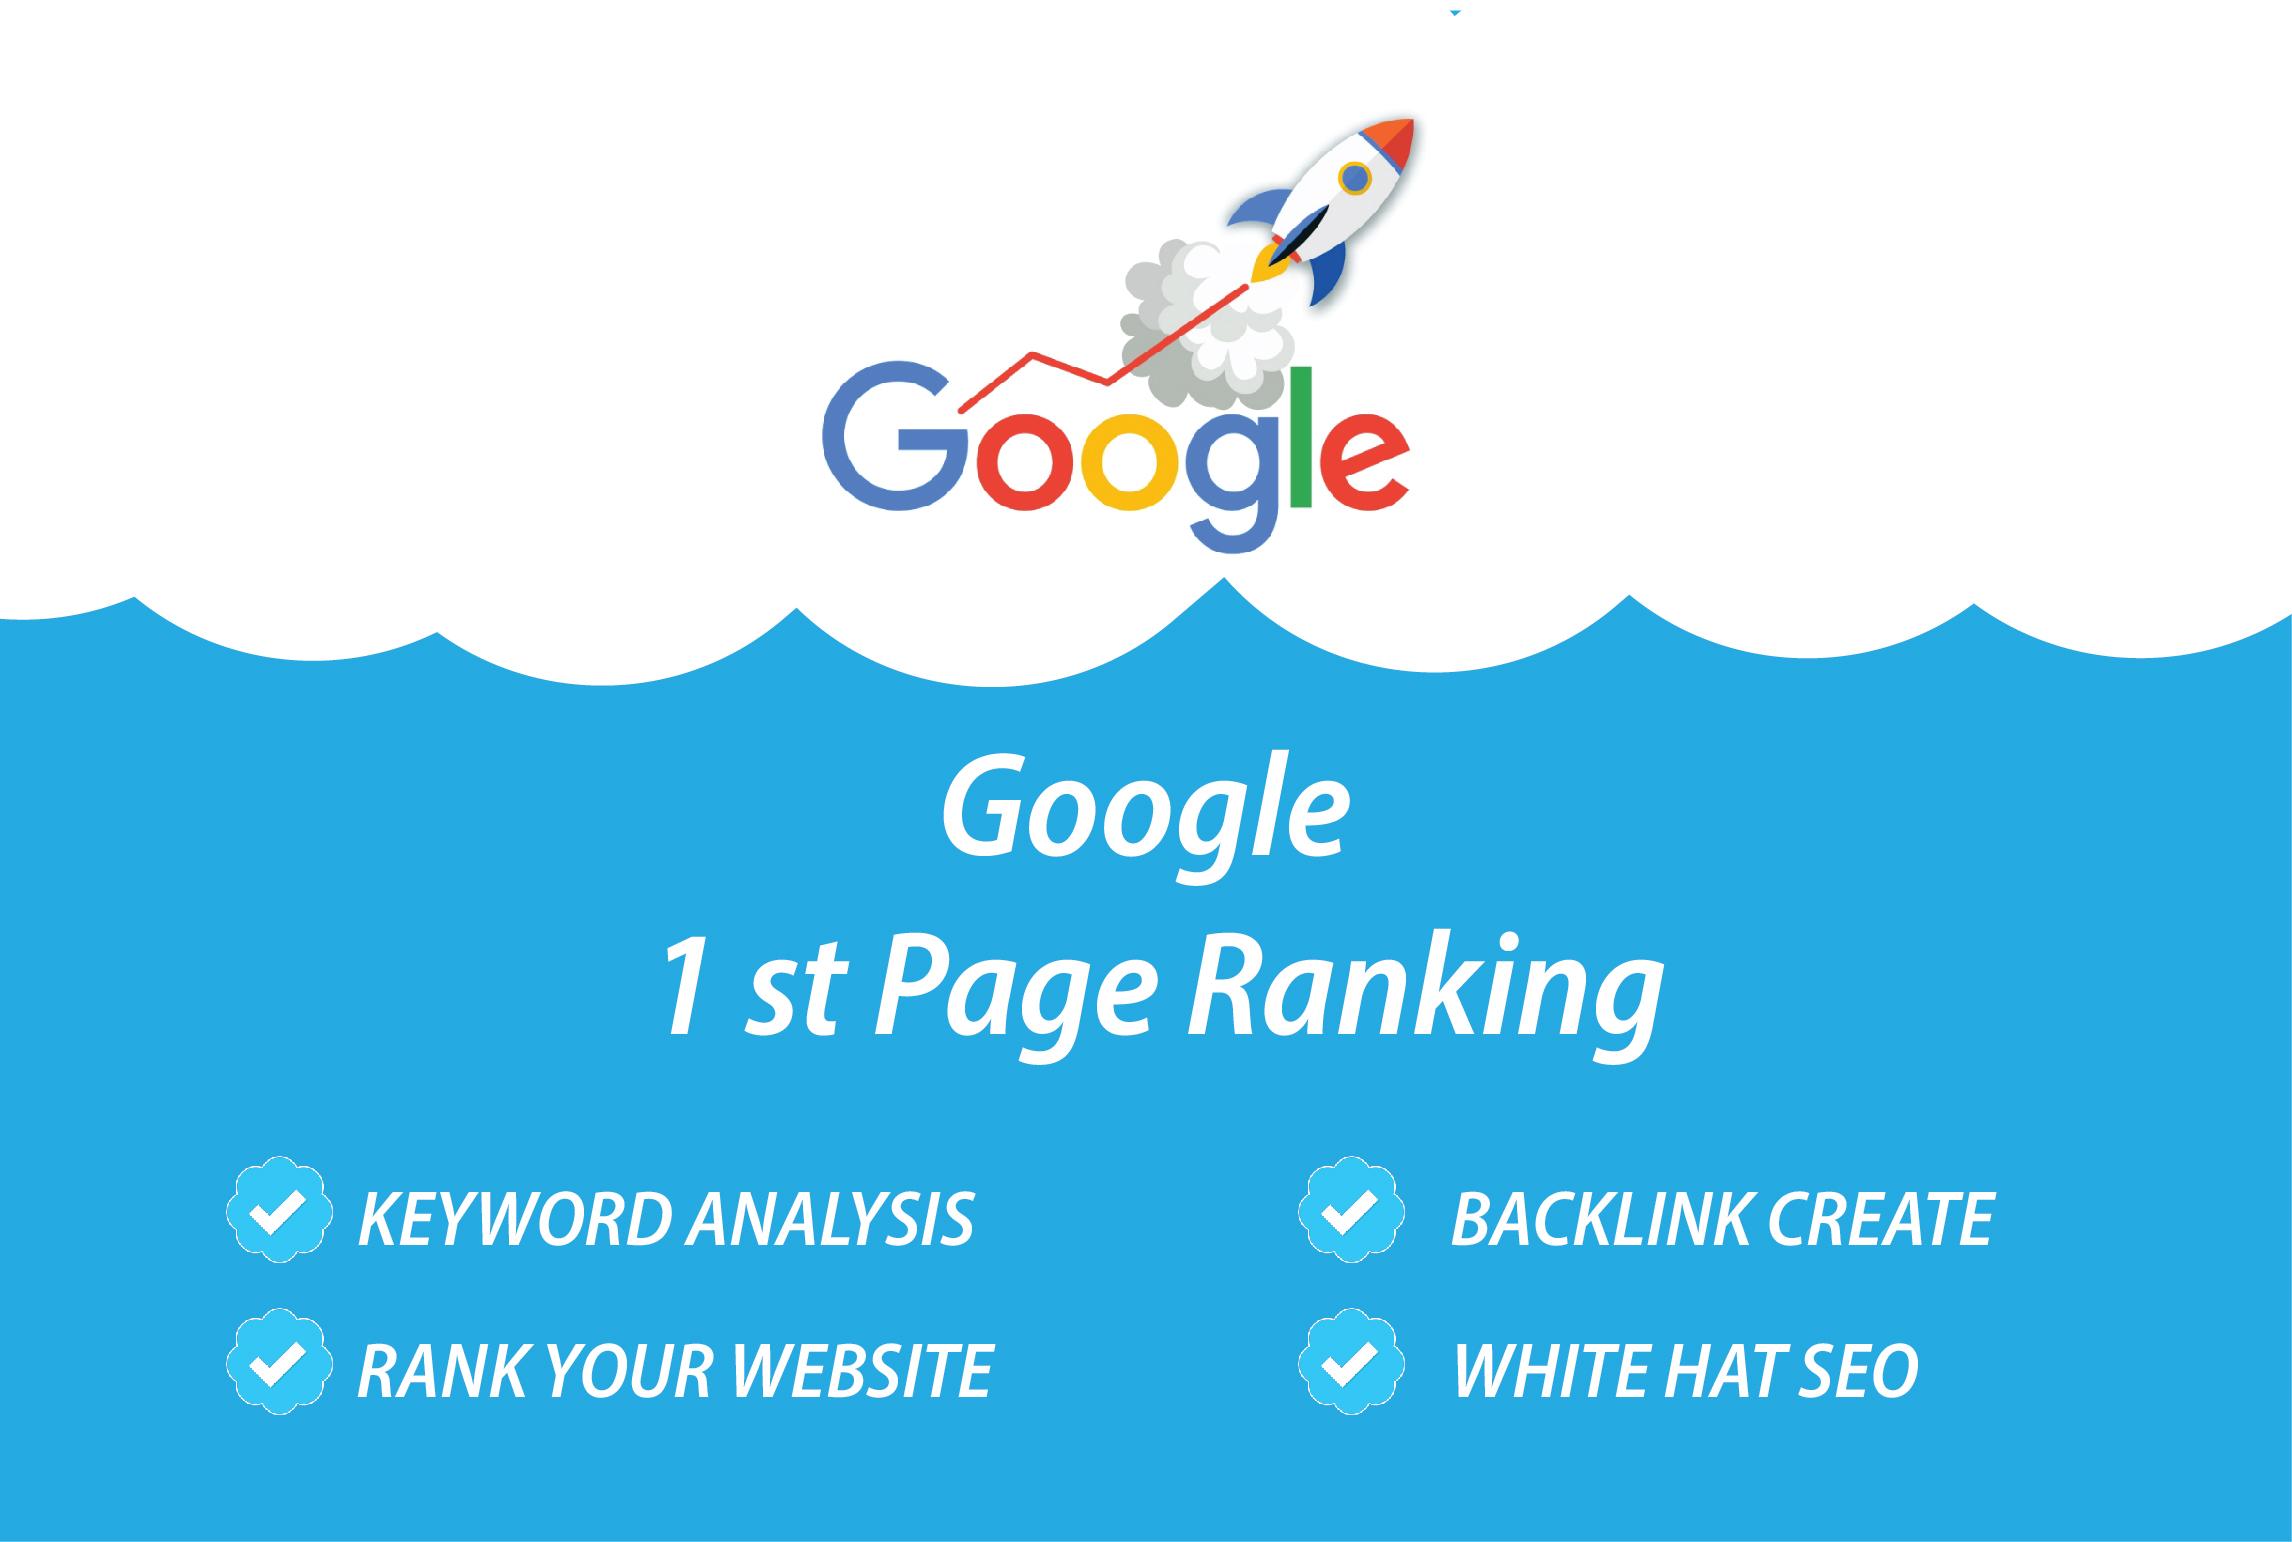 Guaranteed rank your website on Google top ranking